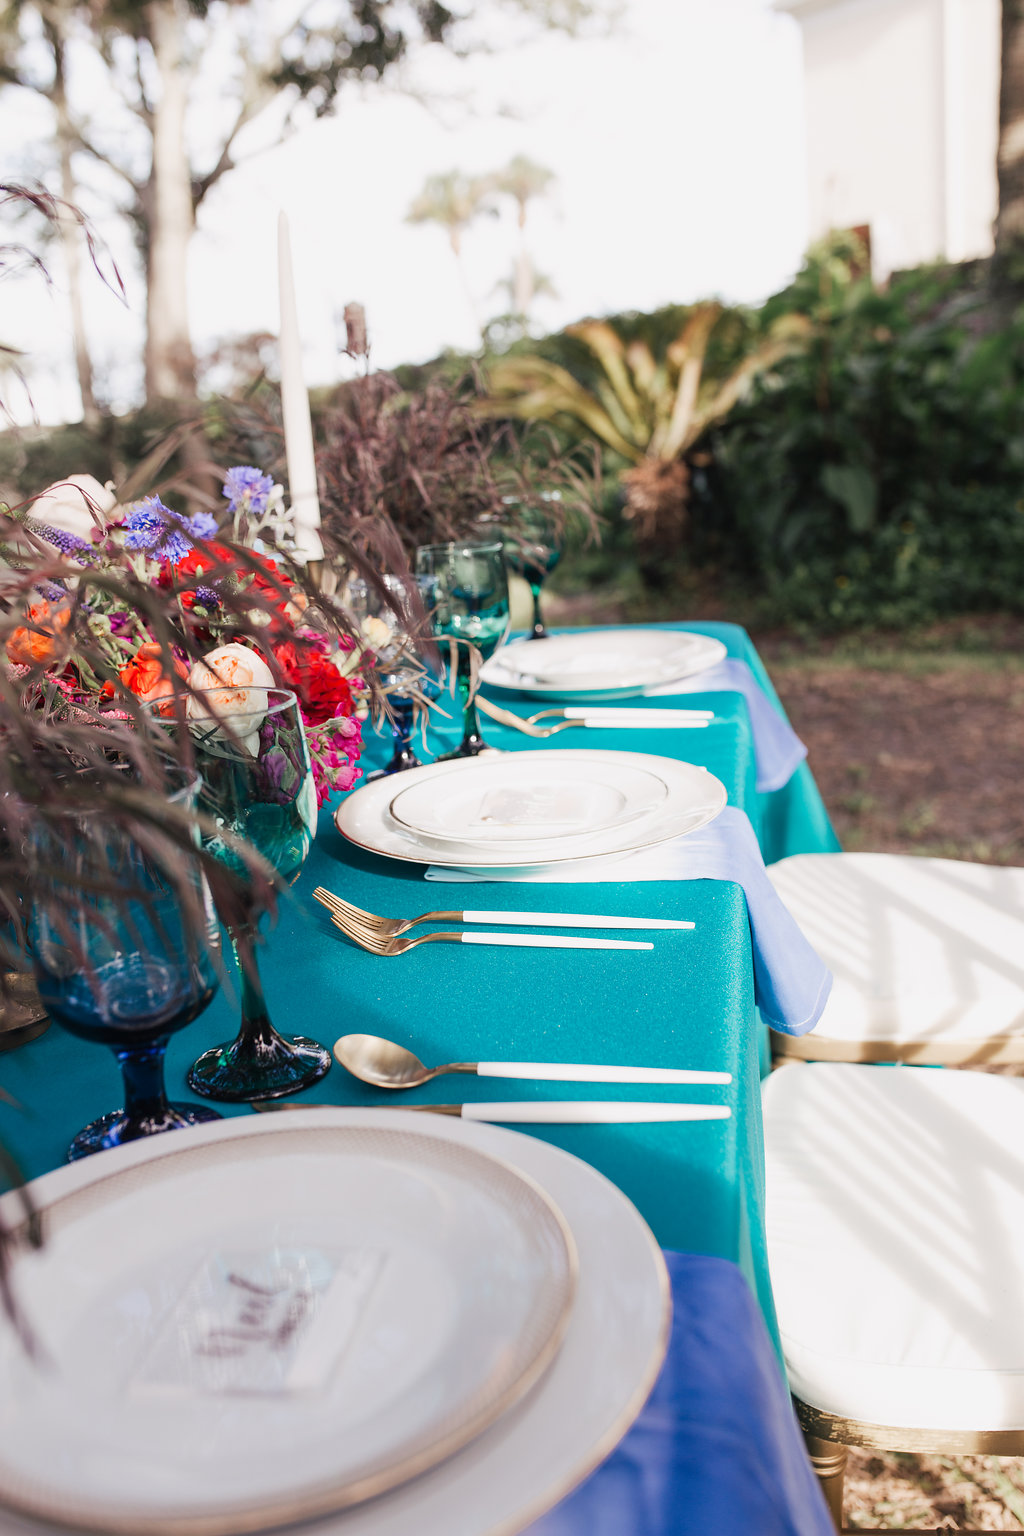 teal at weddings - photo by Alondra Vega Photography https://ruffledblog.com/jewel-toned-wedding-ideas-with-a-surprise-proposal